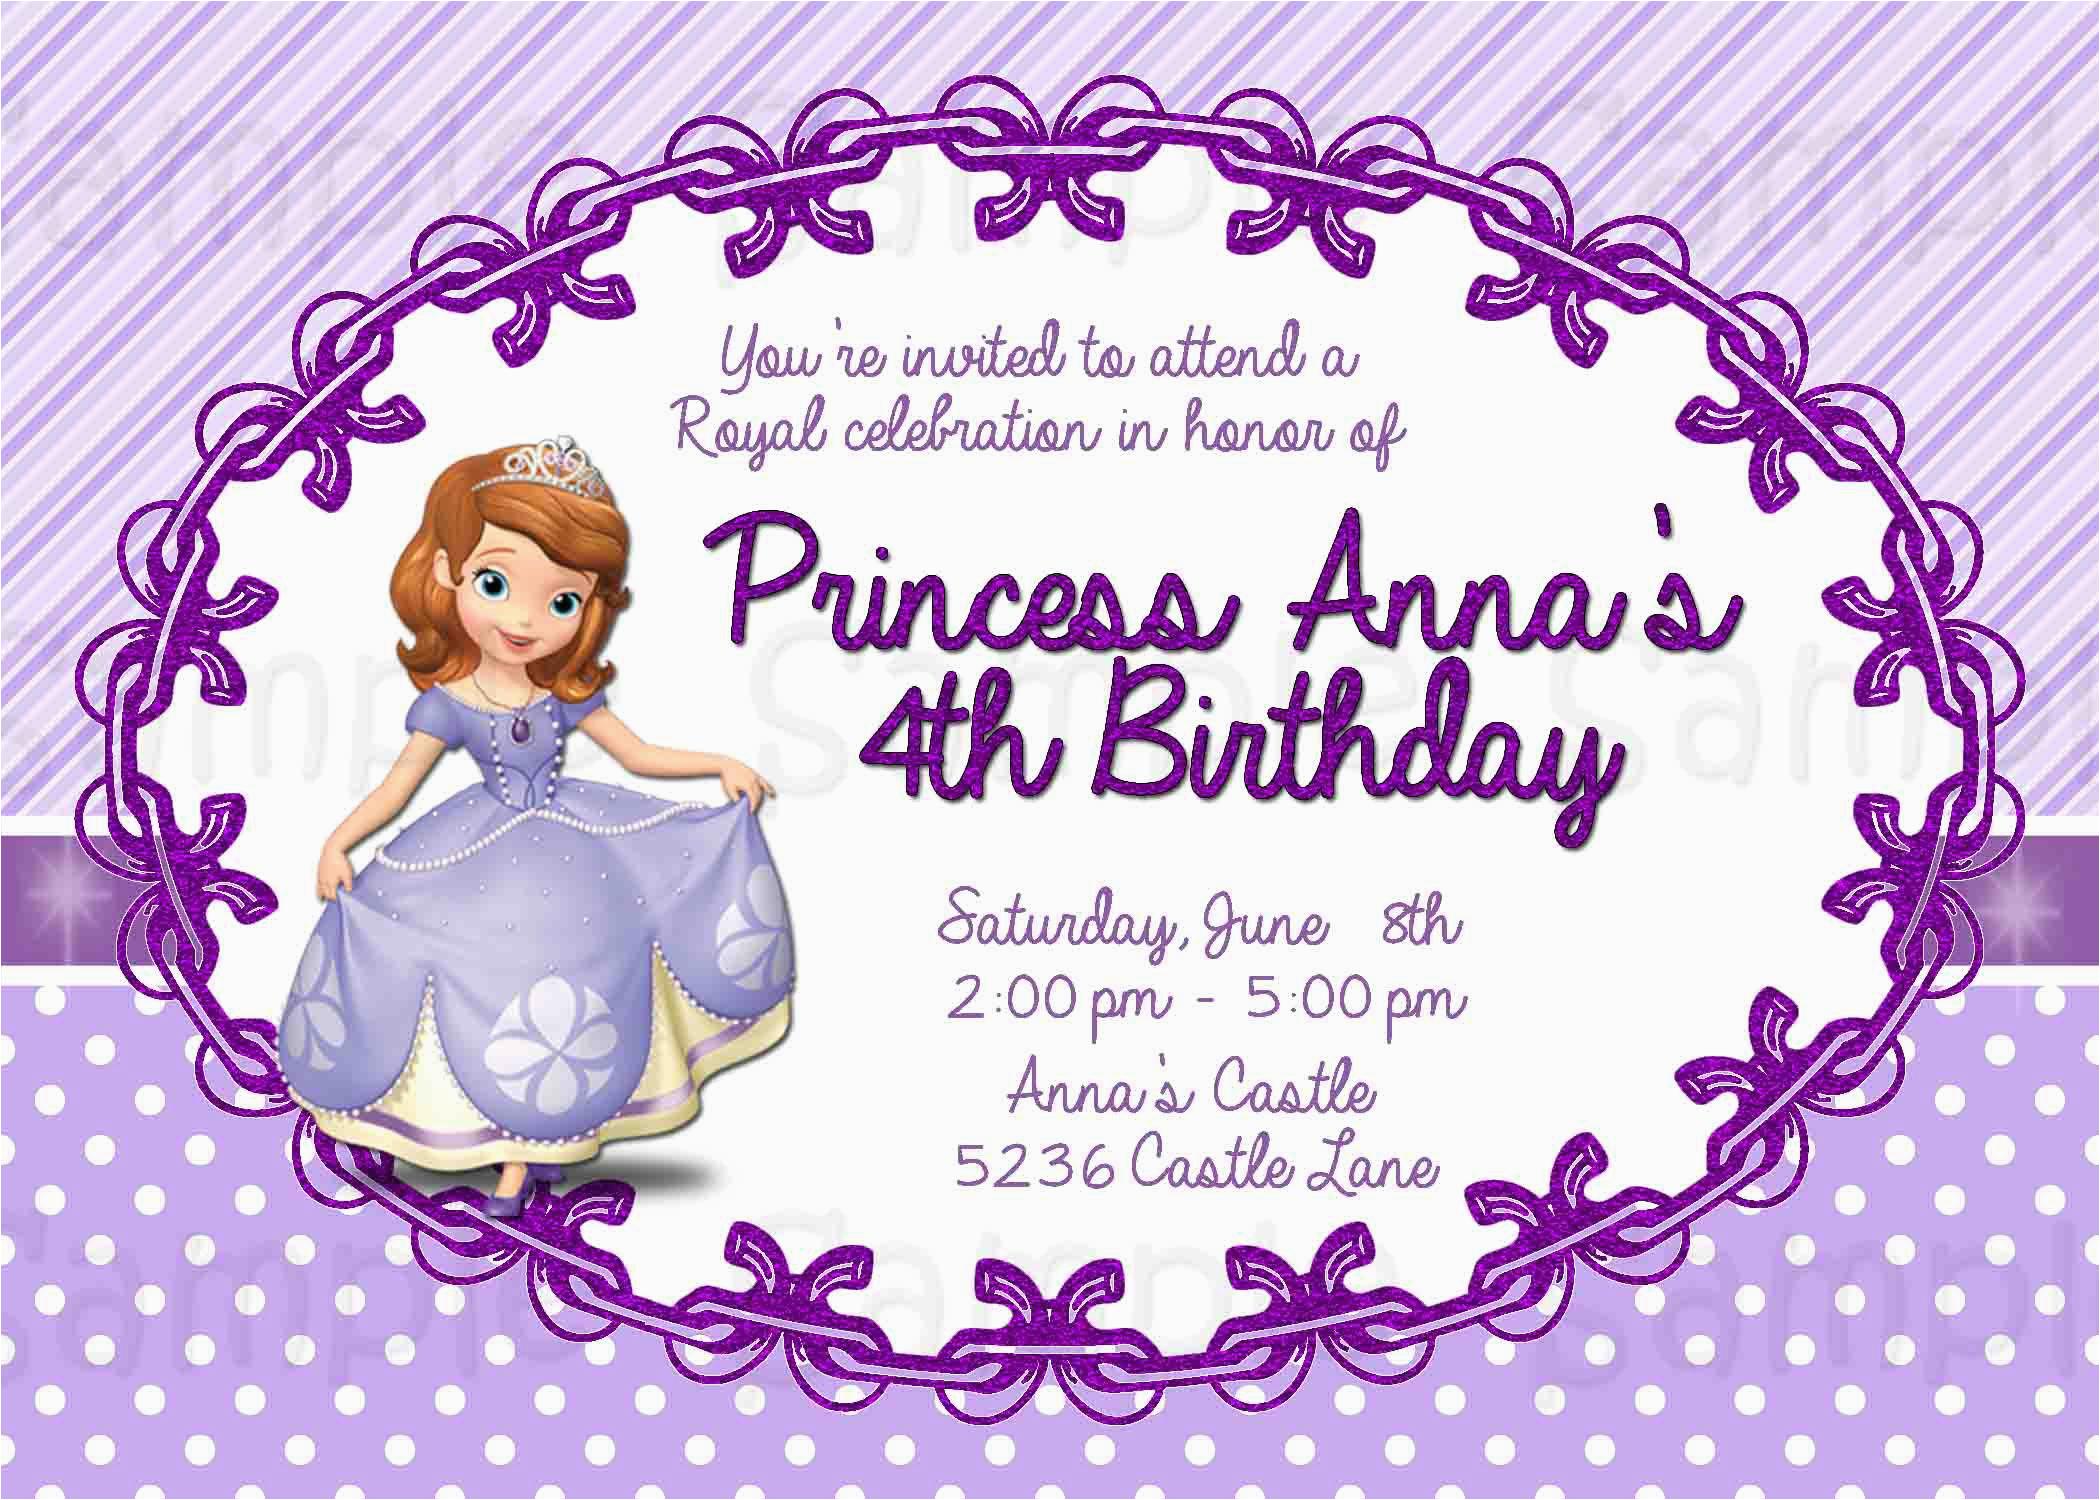 Customized Birthday Invitations Online Invitation Card Free Printable 1st